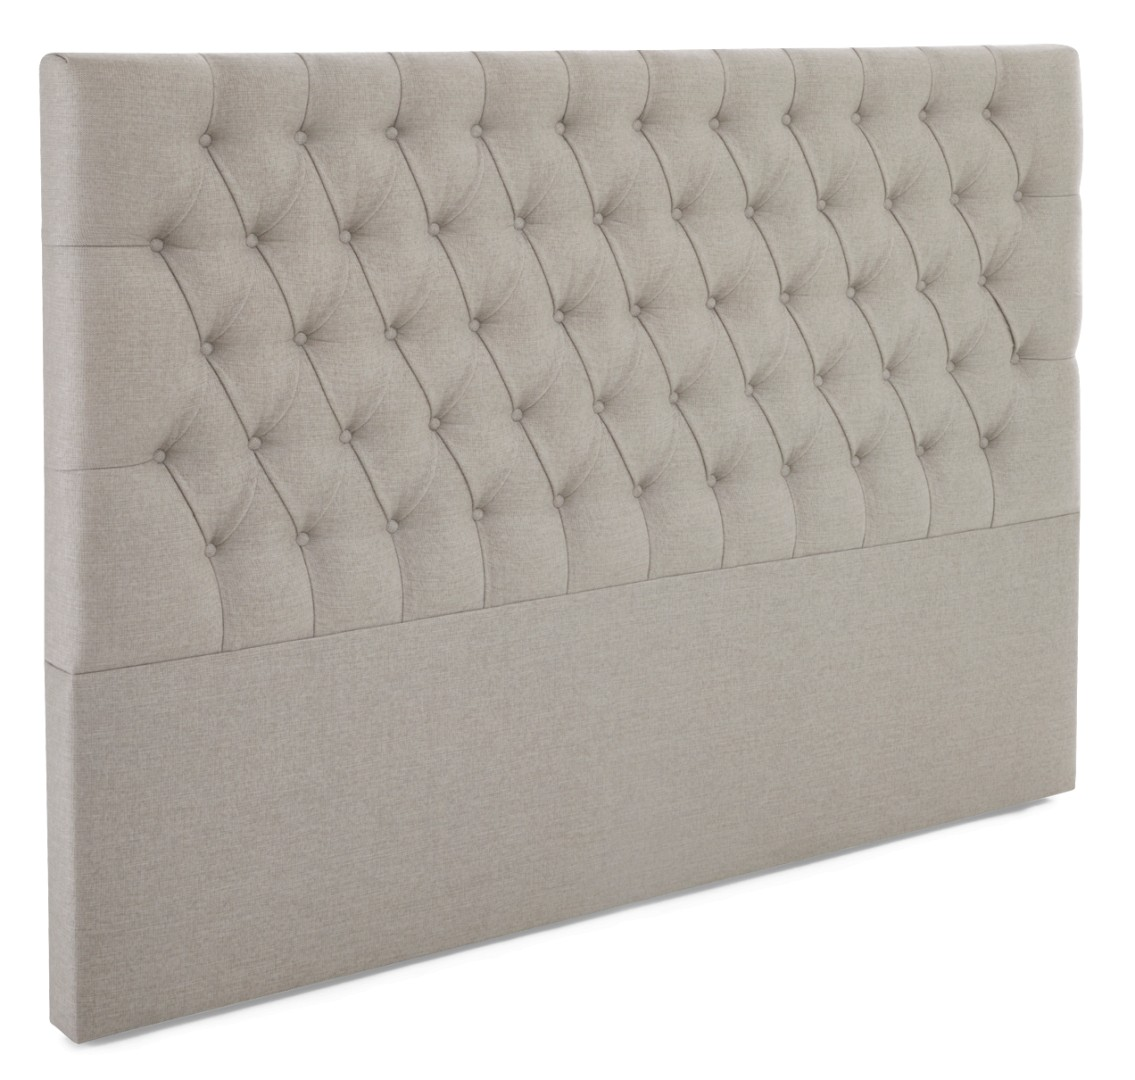 Asko Bonnell ELISE-sängynpääty 160 cm